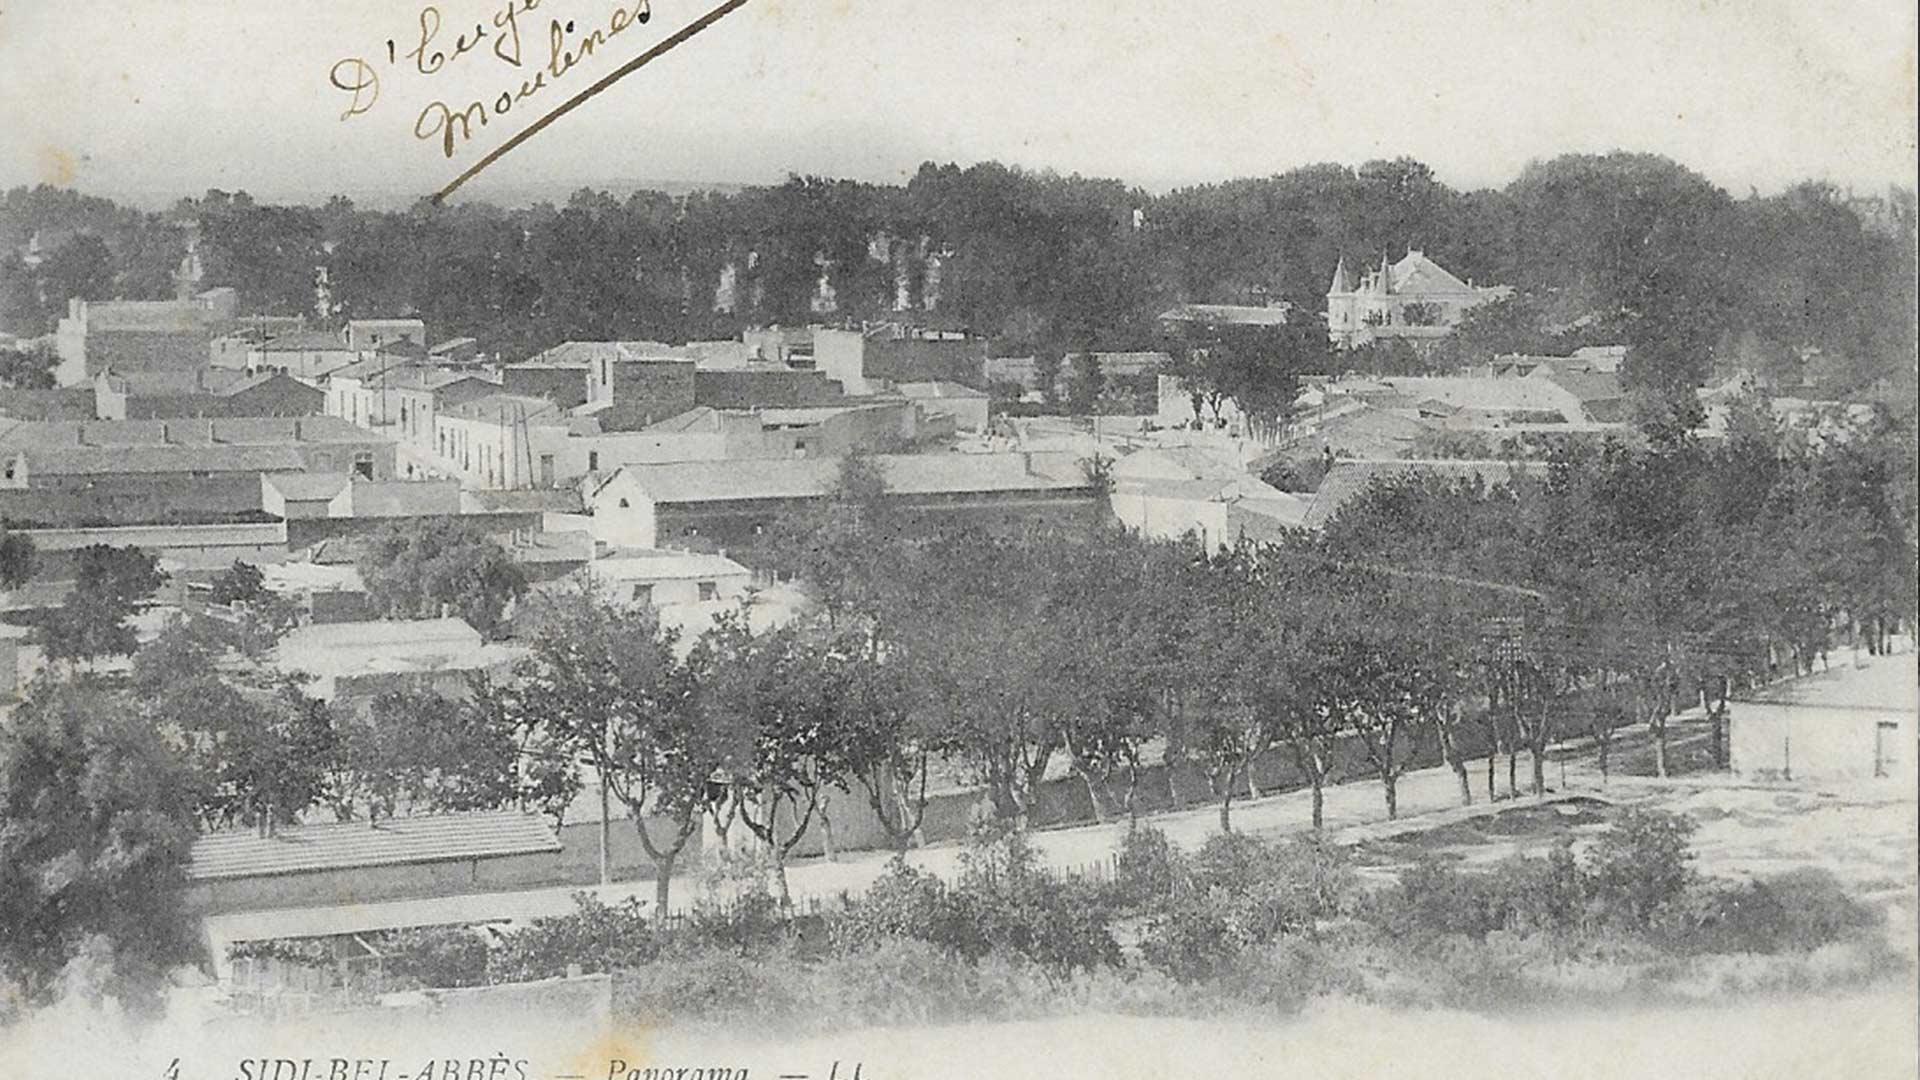 Sidi-Bel-Abbes-Panorama